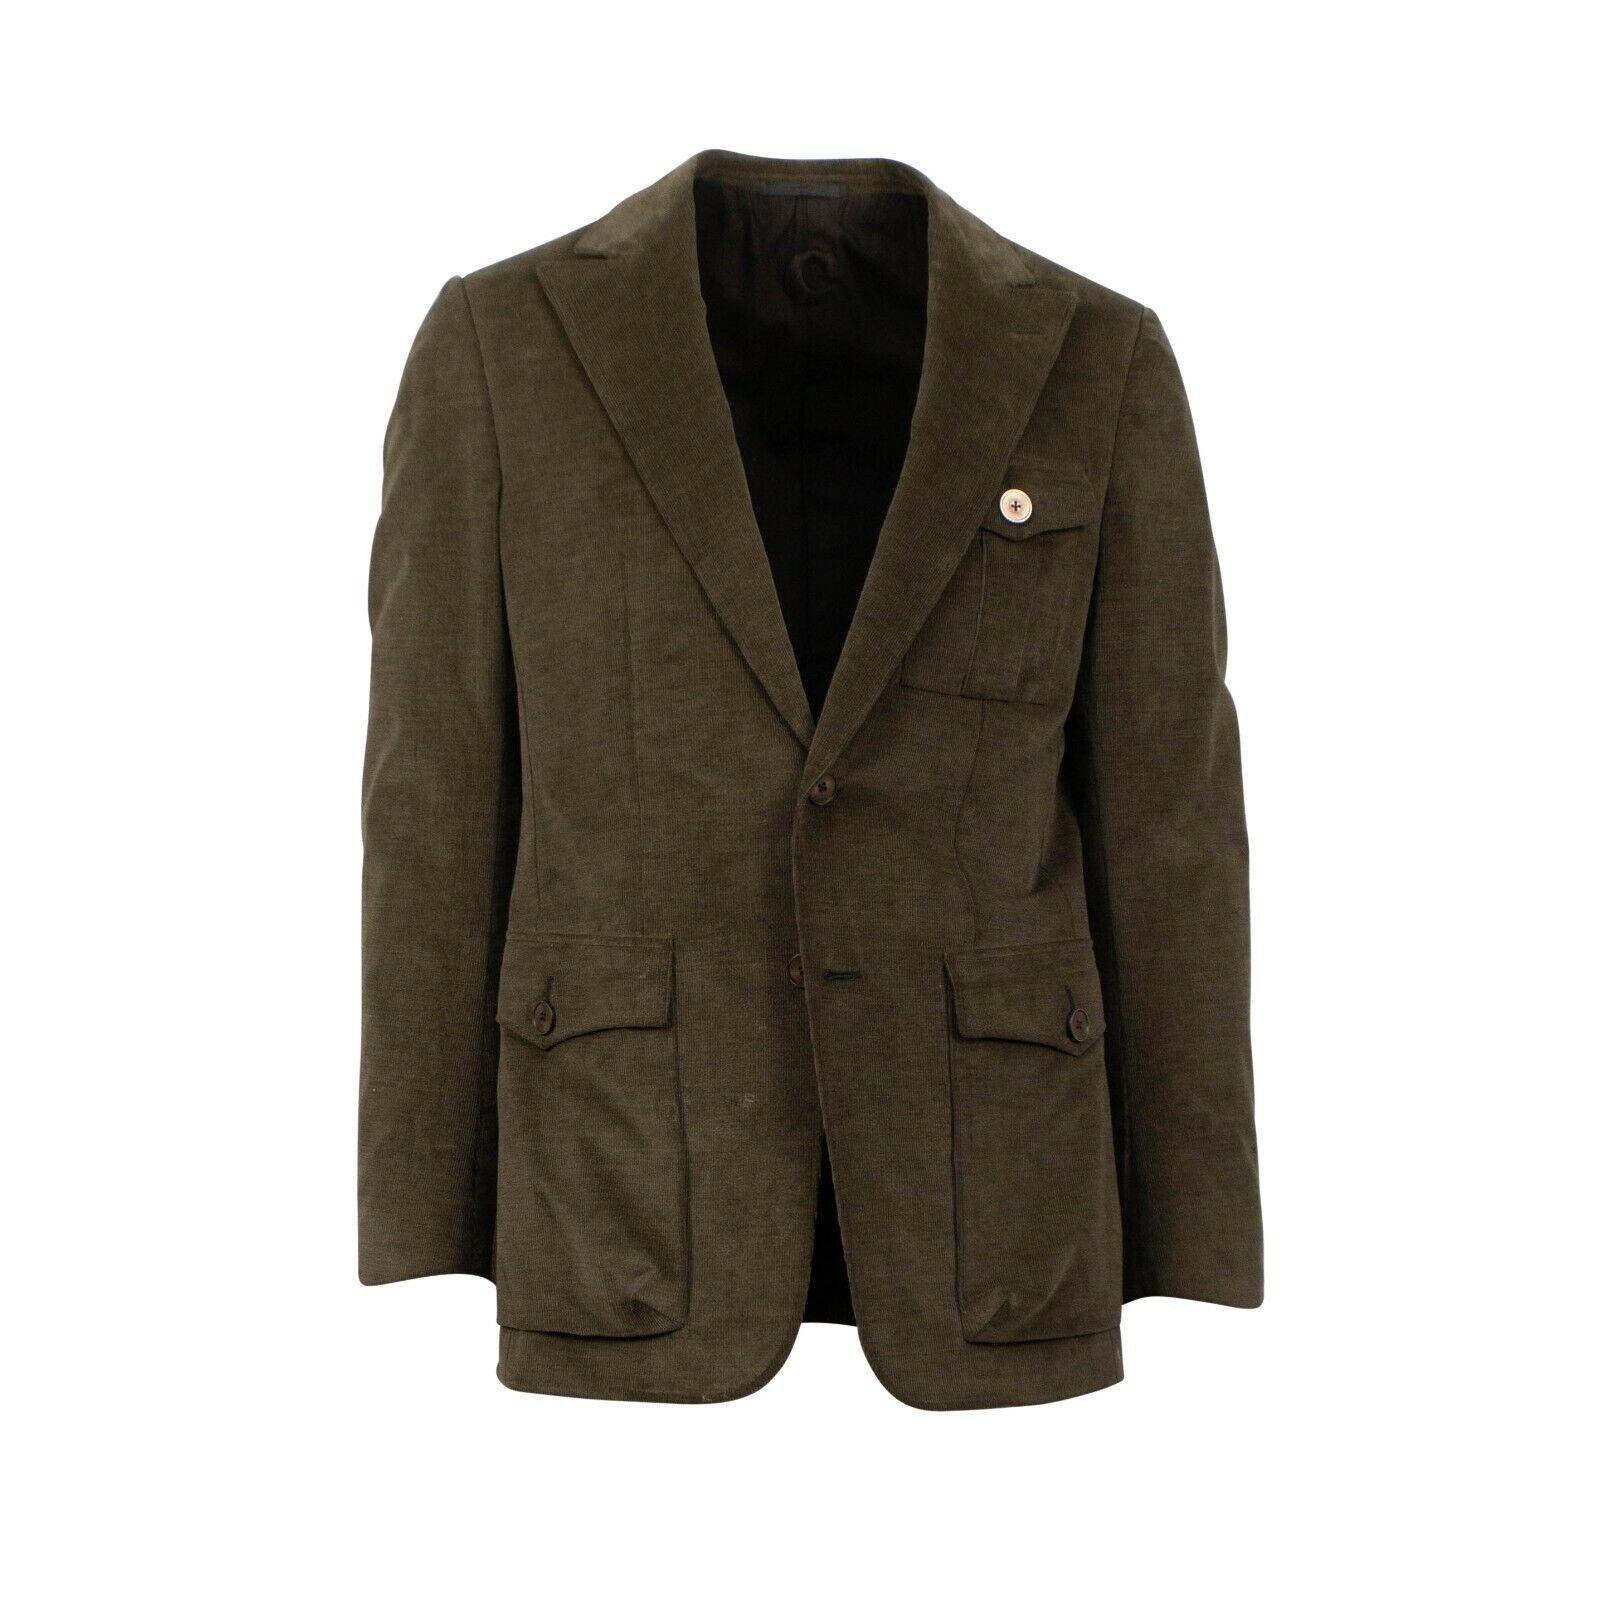 NWT CARUSO Green Corduroy Two Button Cotton Blend Sport Coat 52 42 R Drop 8